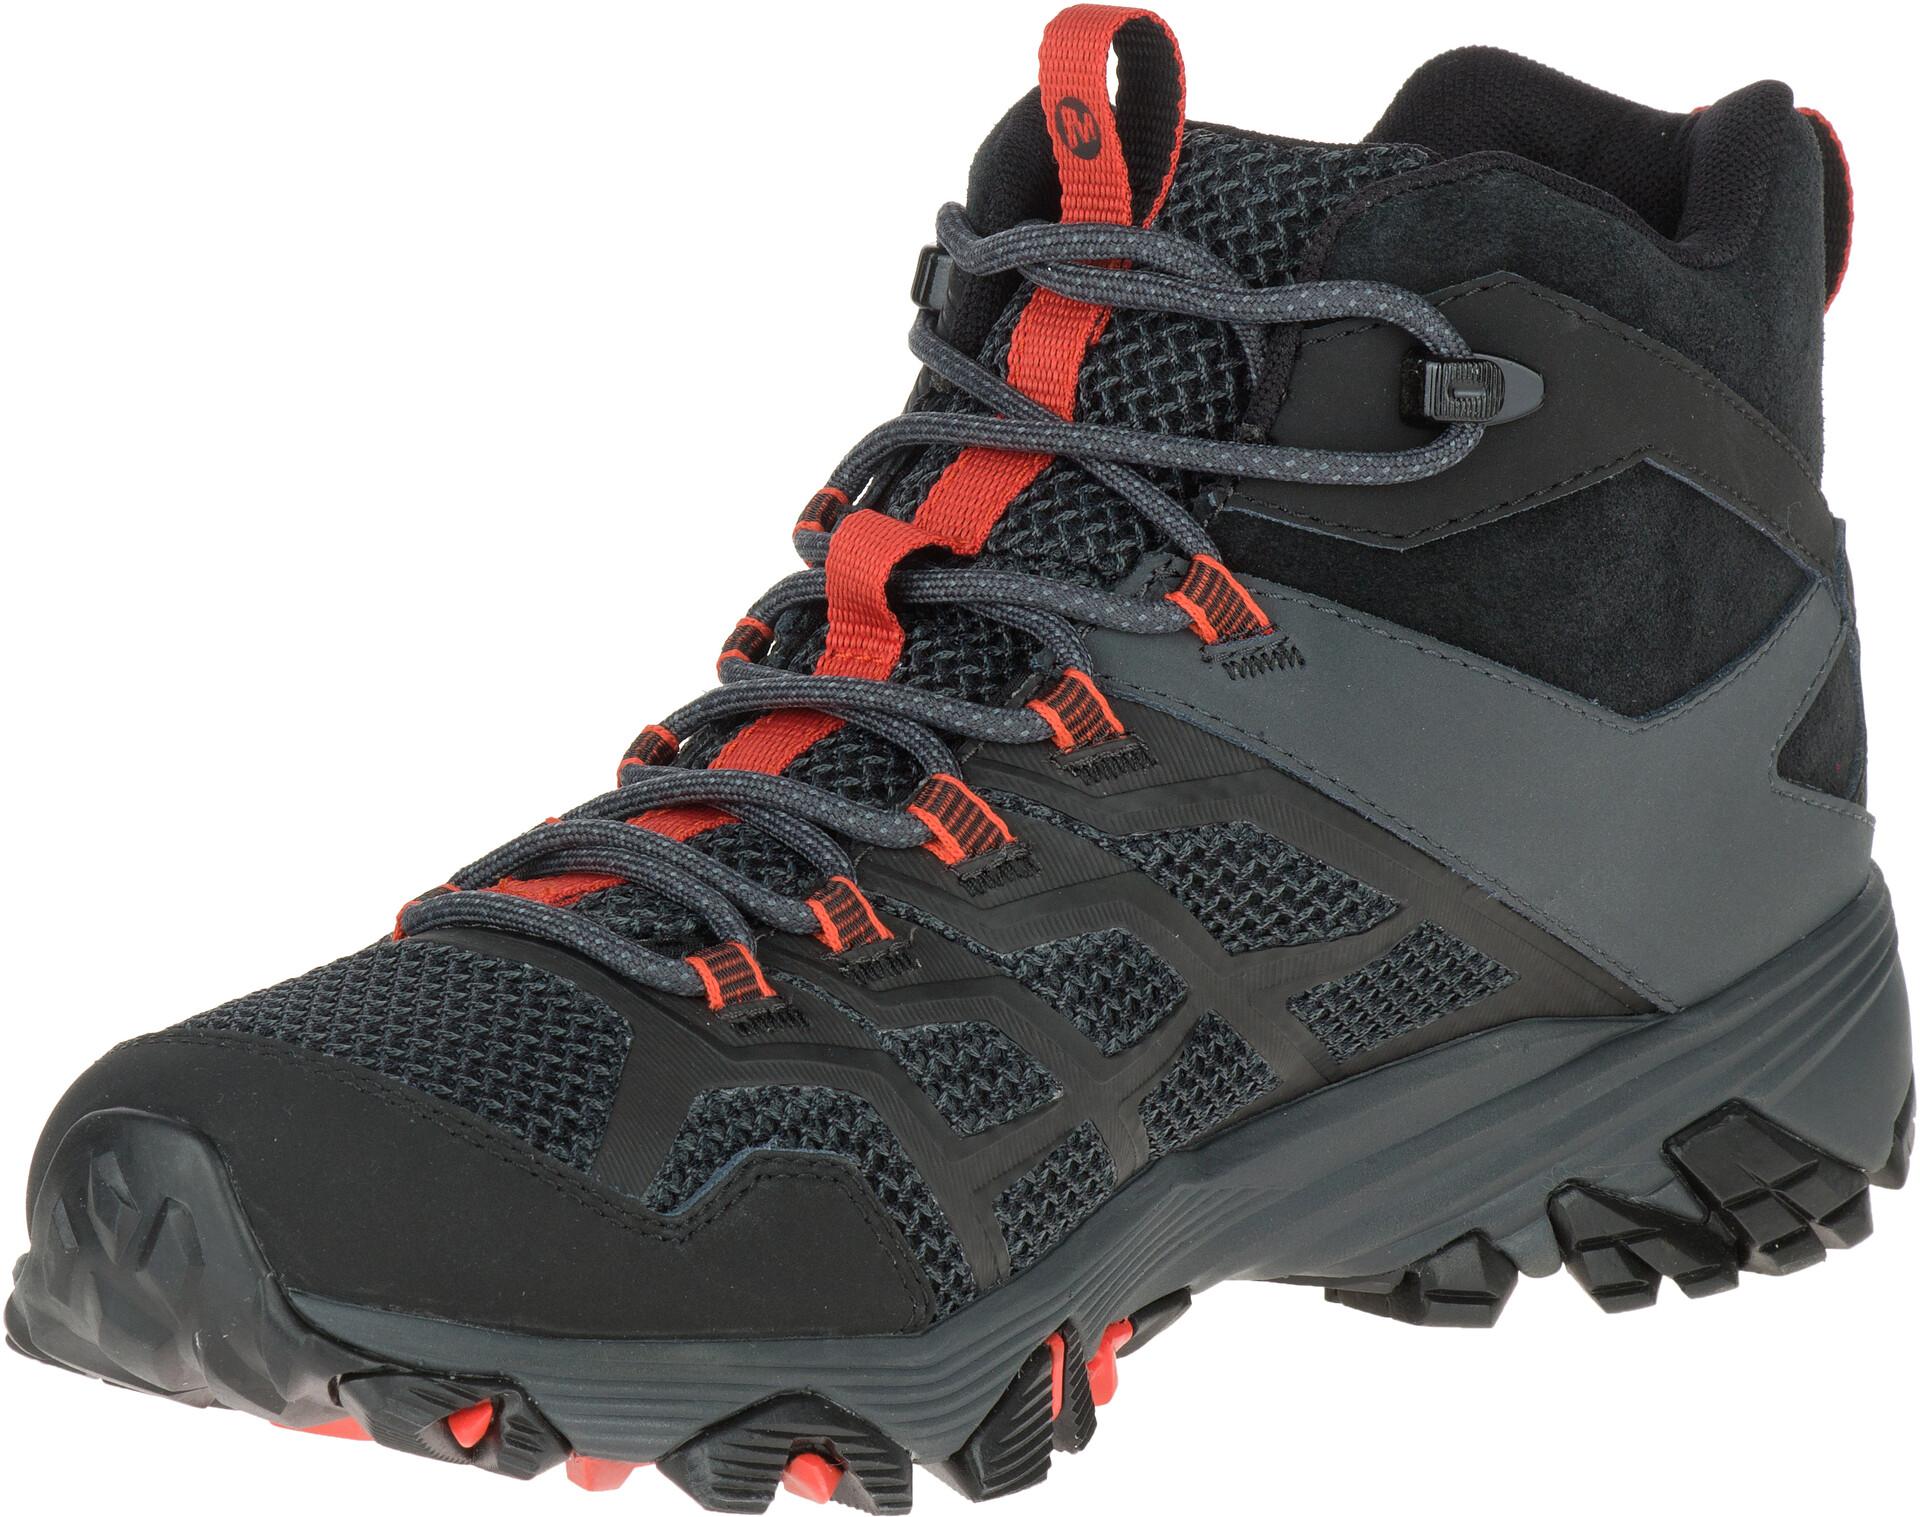 Merrell Moab FST 2 GTX Chaussures Homme, blackgranite sur